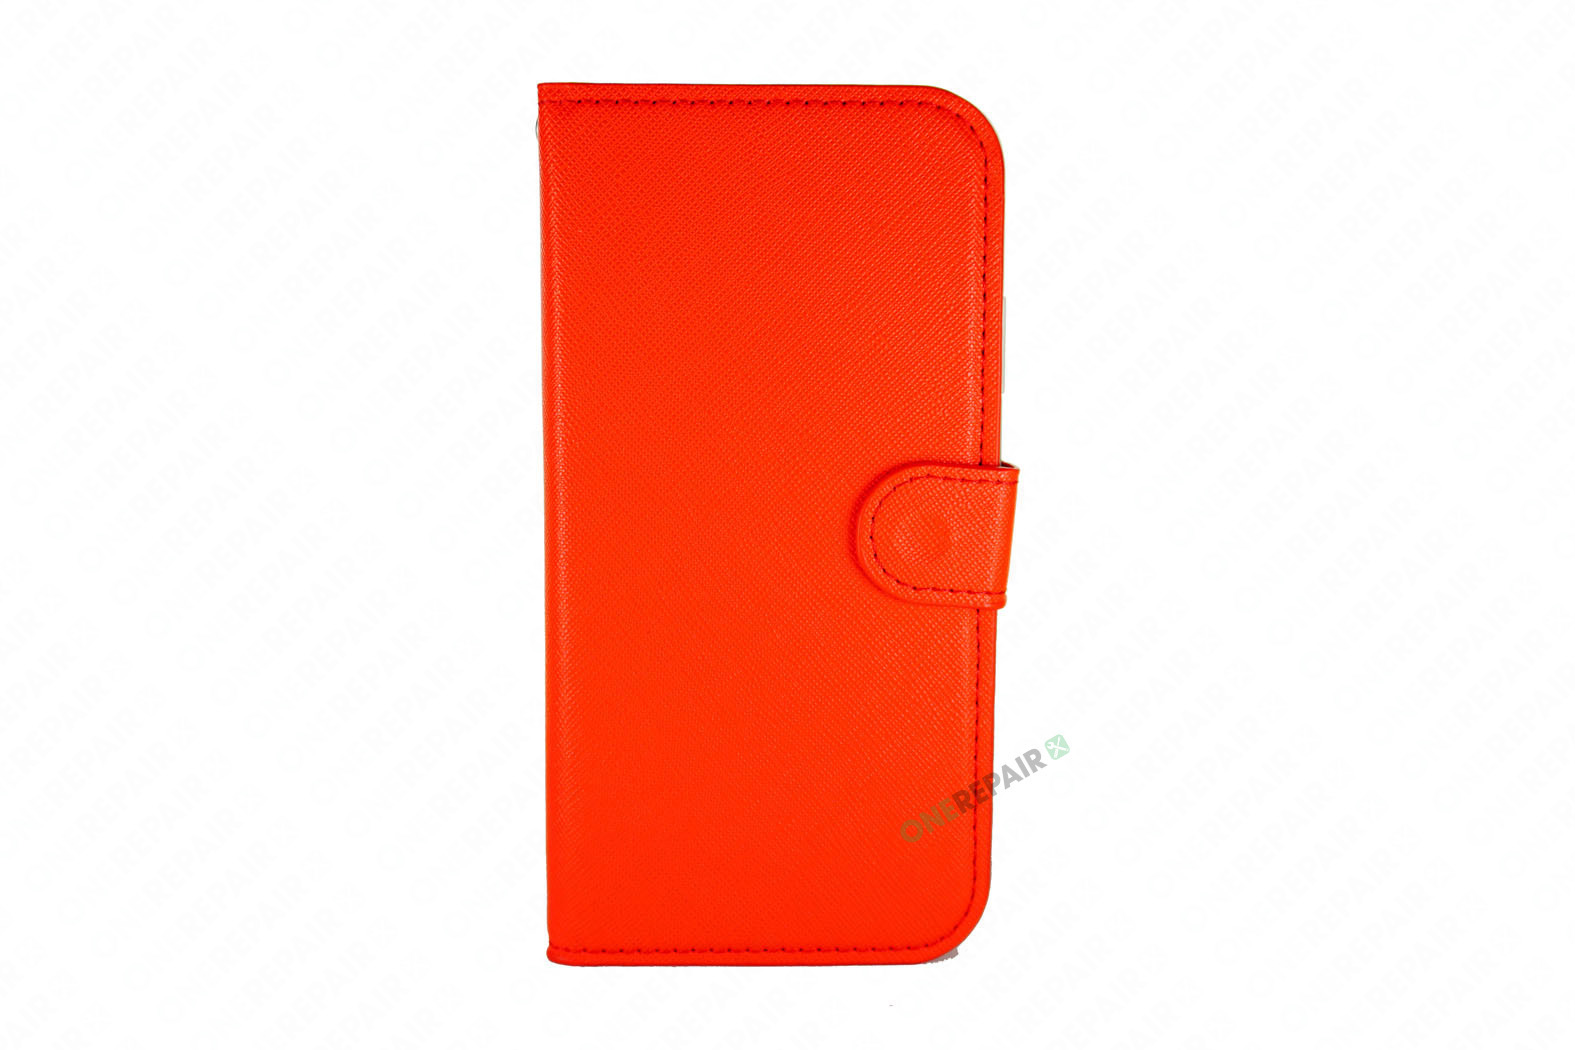 353703-003_iPhone_11_Flipcover_med_magnet_Plads_til_kort_Roed_Cover_OneRepair_00001